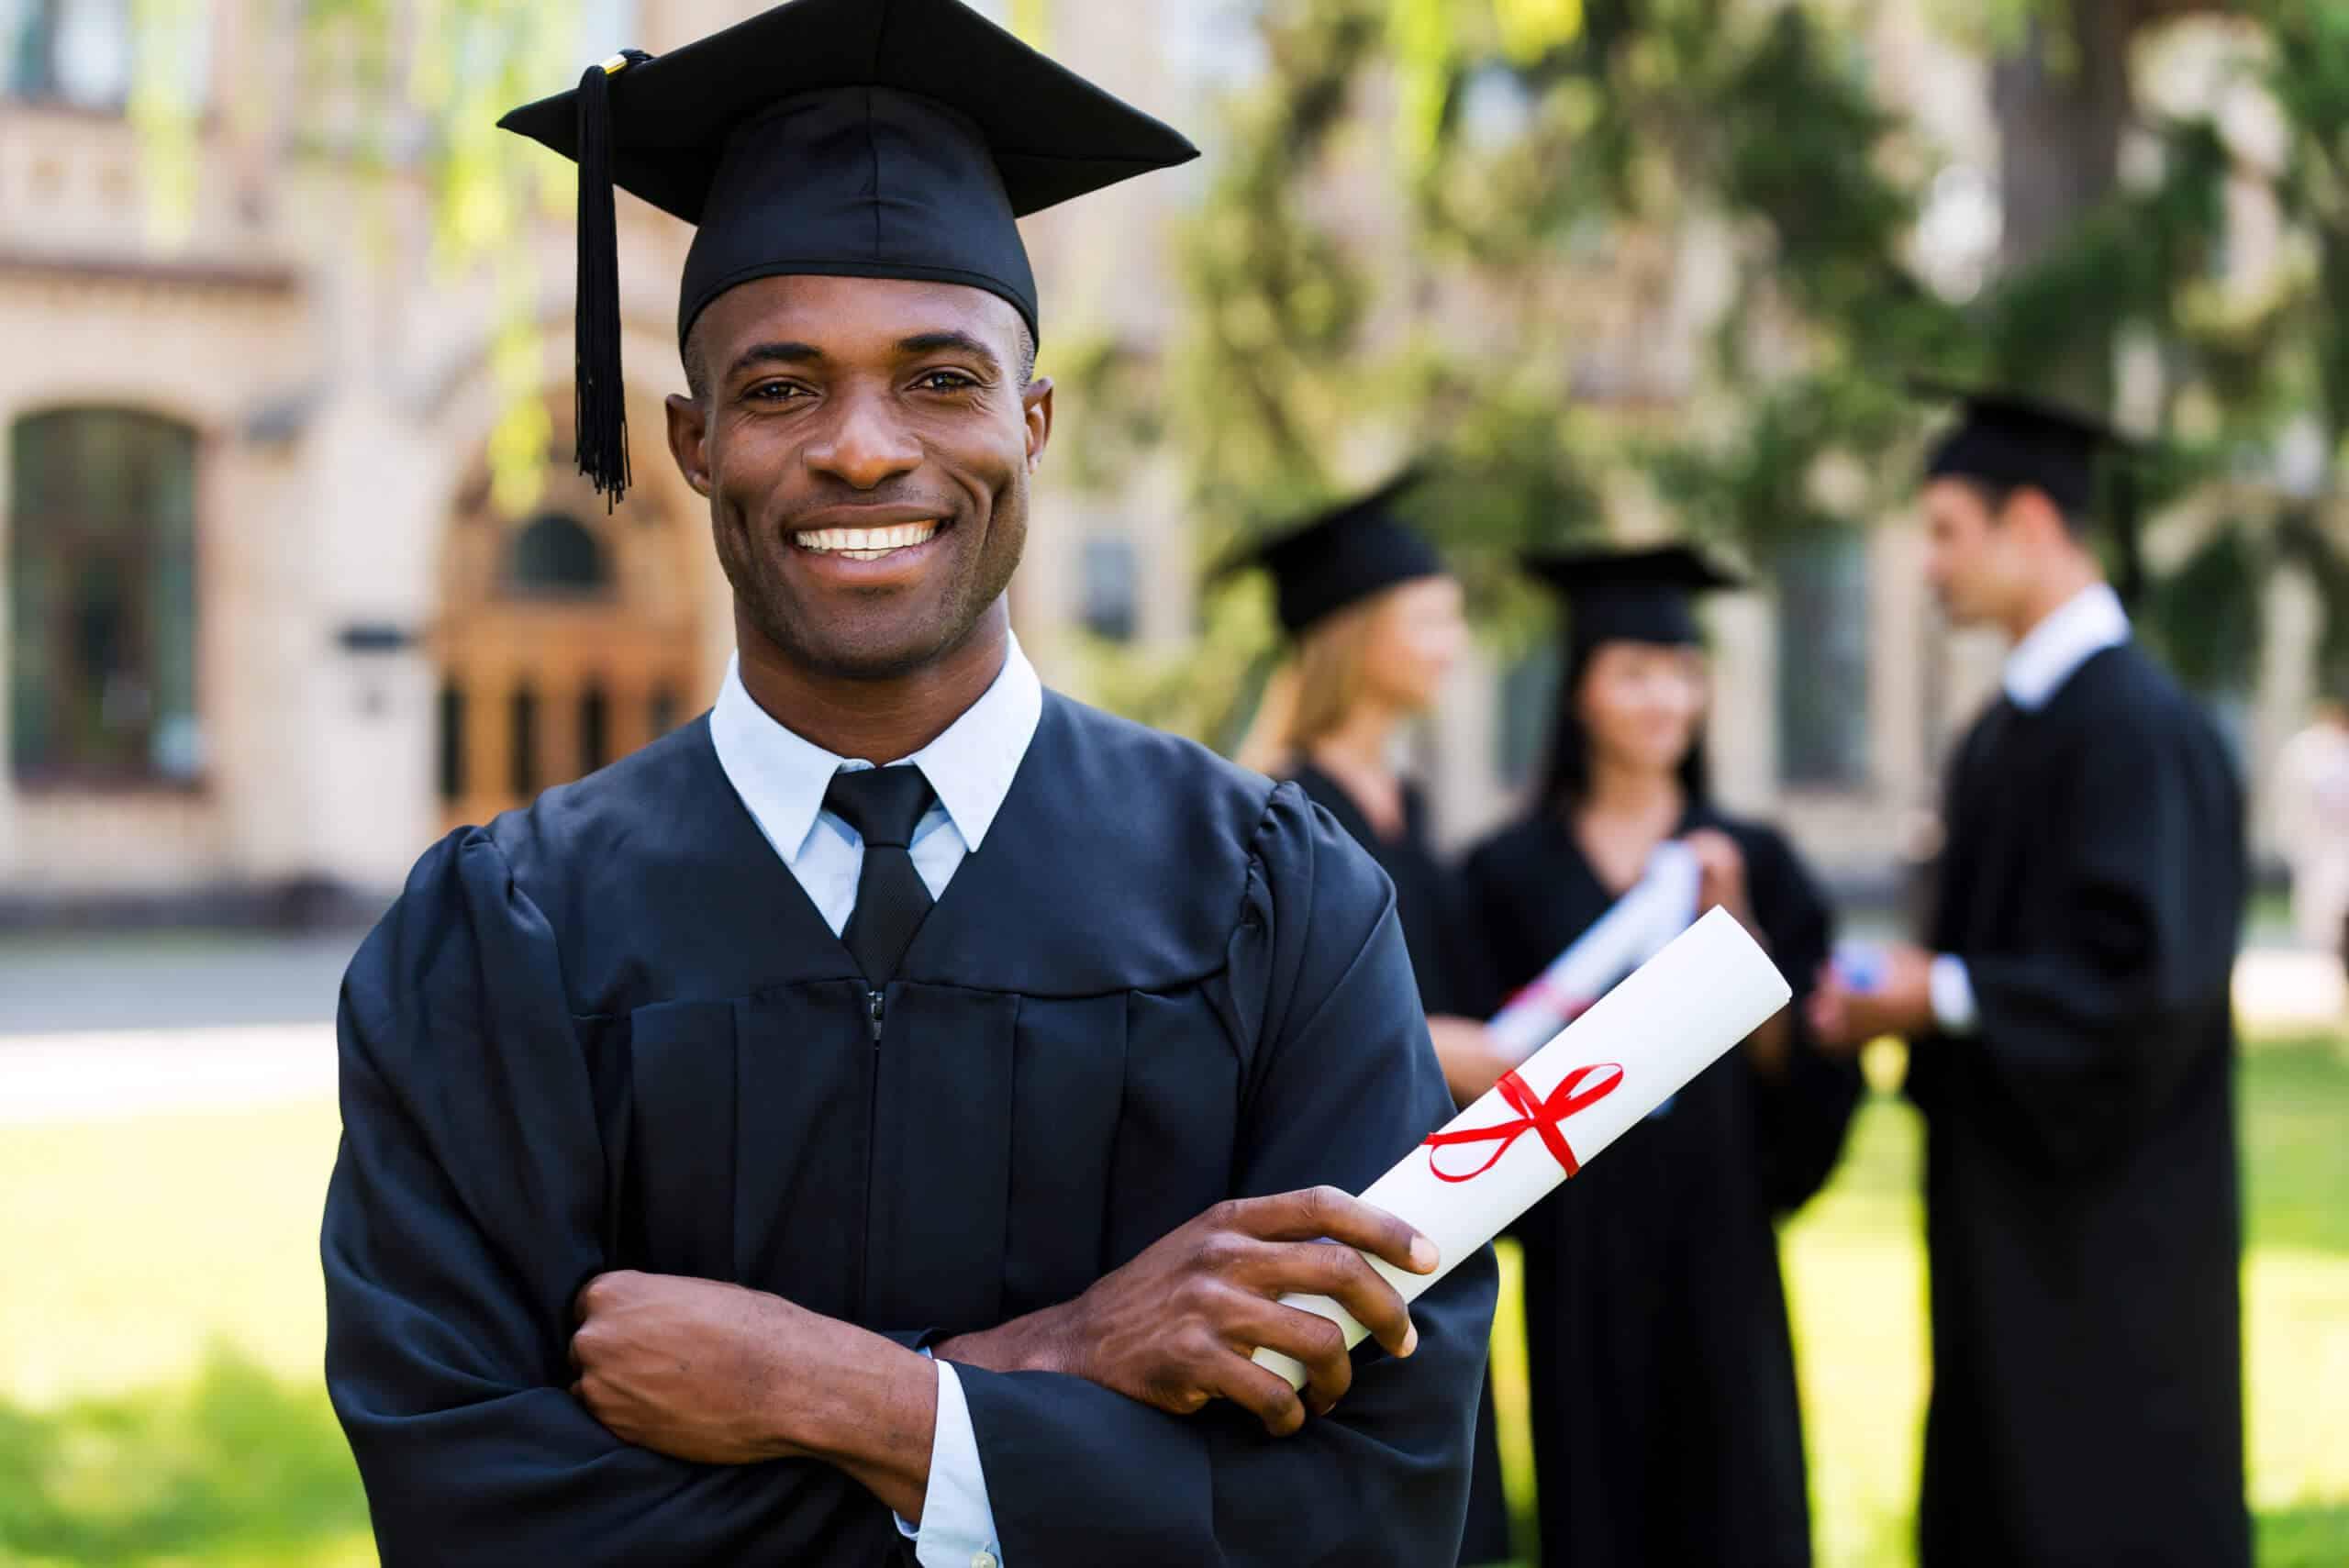 U.S. Student Visa - Study in the U.S